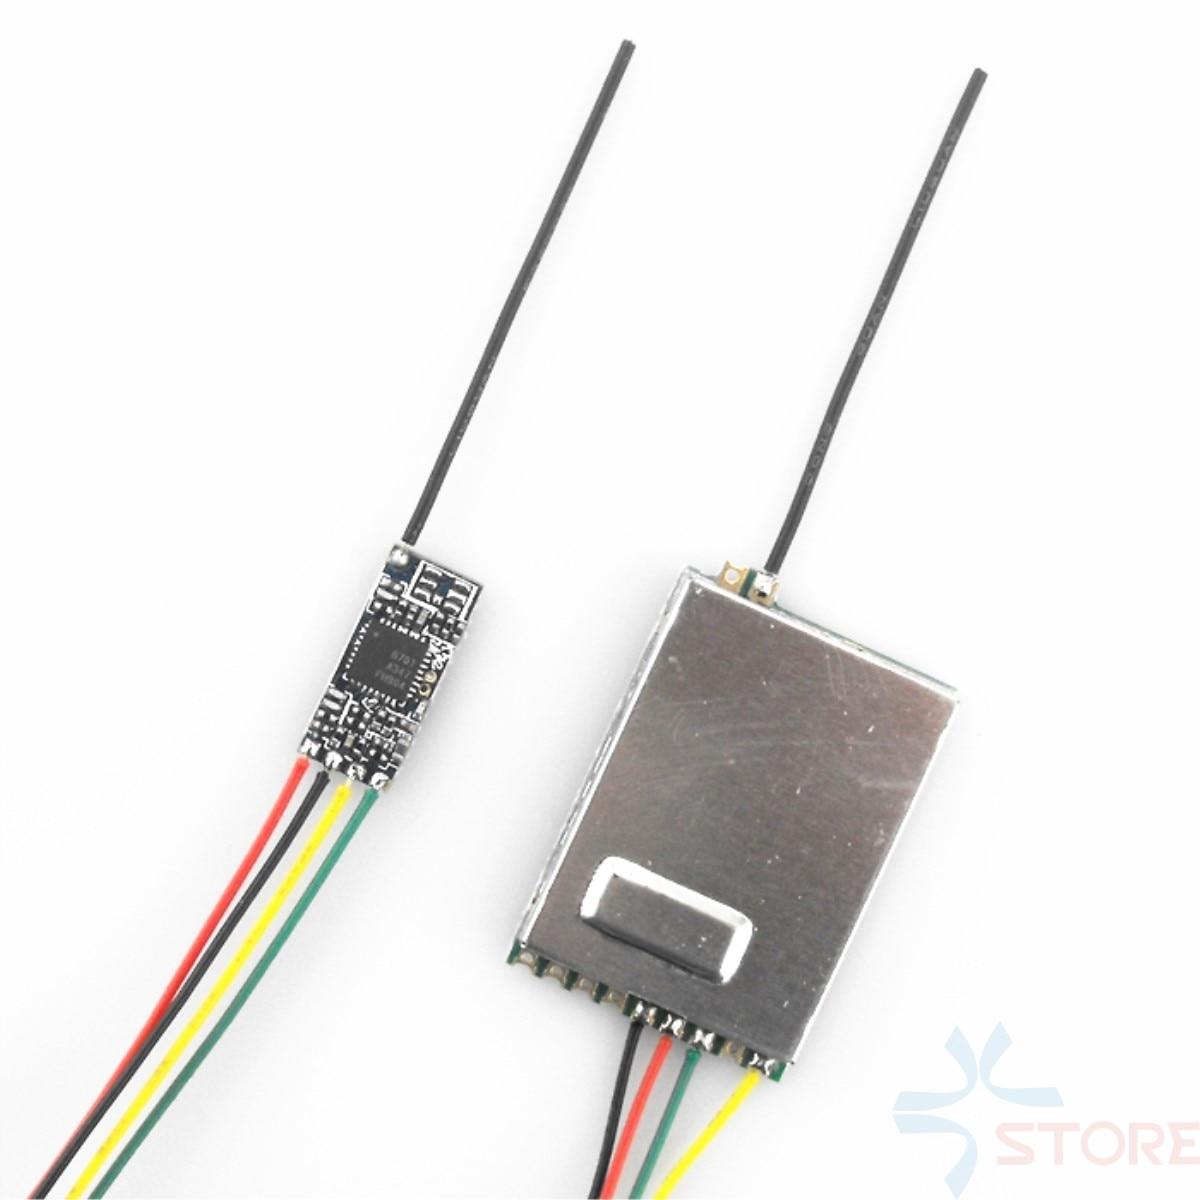 2.4Ghz wireless surveillance video transmitter small camera module 2.4G 100MW wireless micro audio video transceiver module set